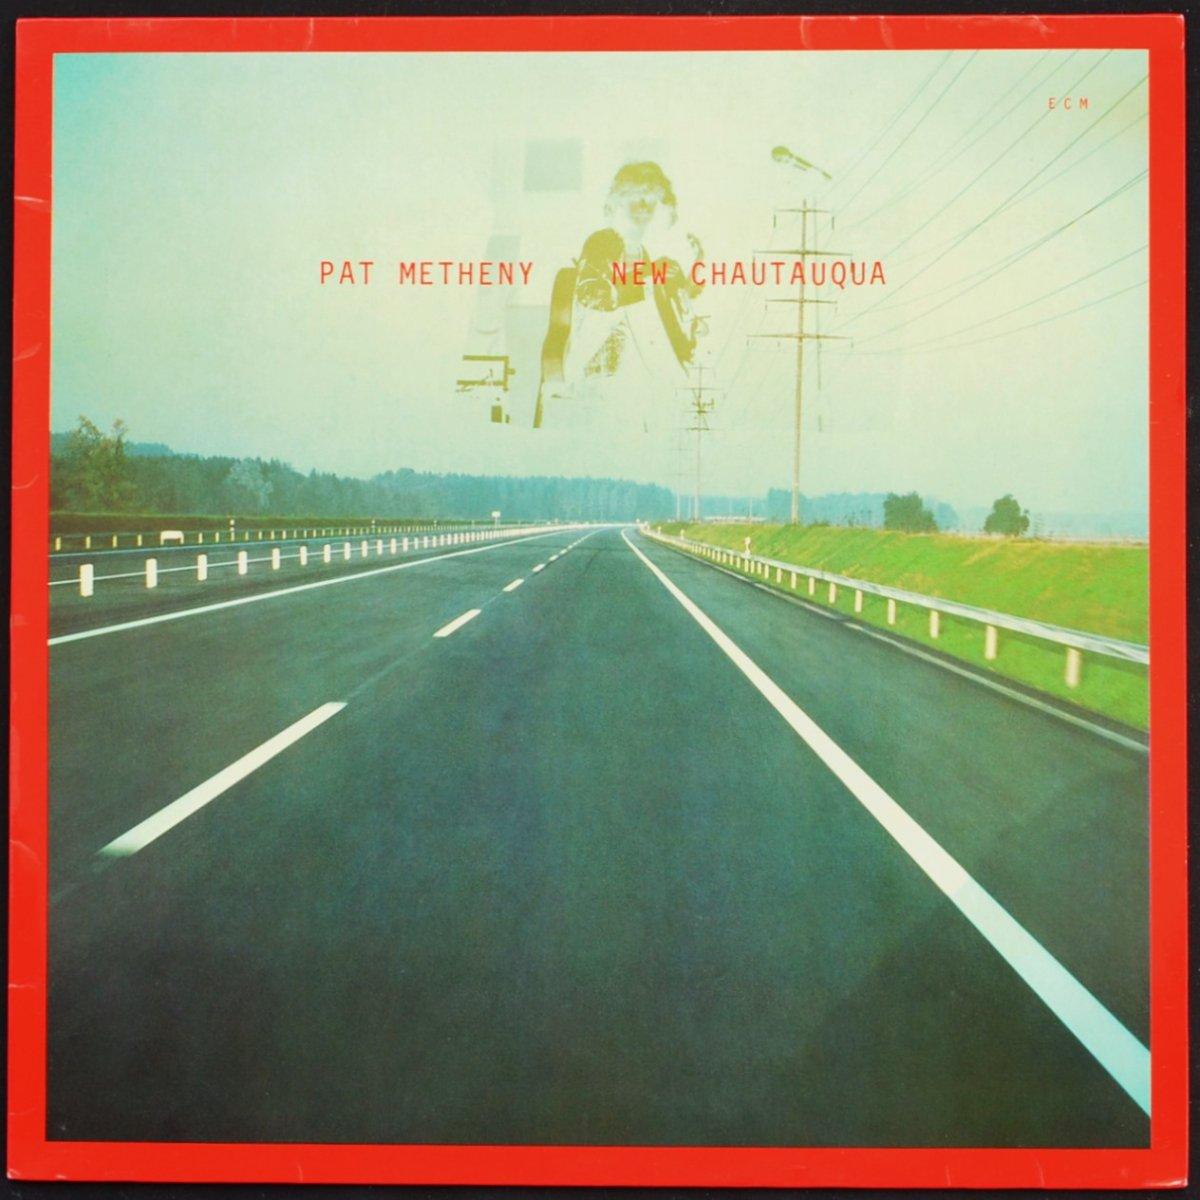 PAT METHENY / NEW CHAUTAUQUA (LP)